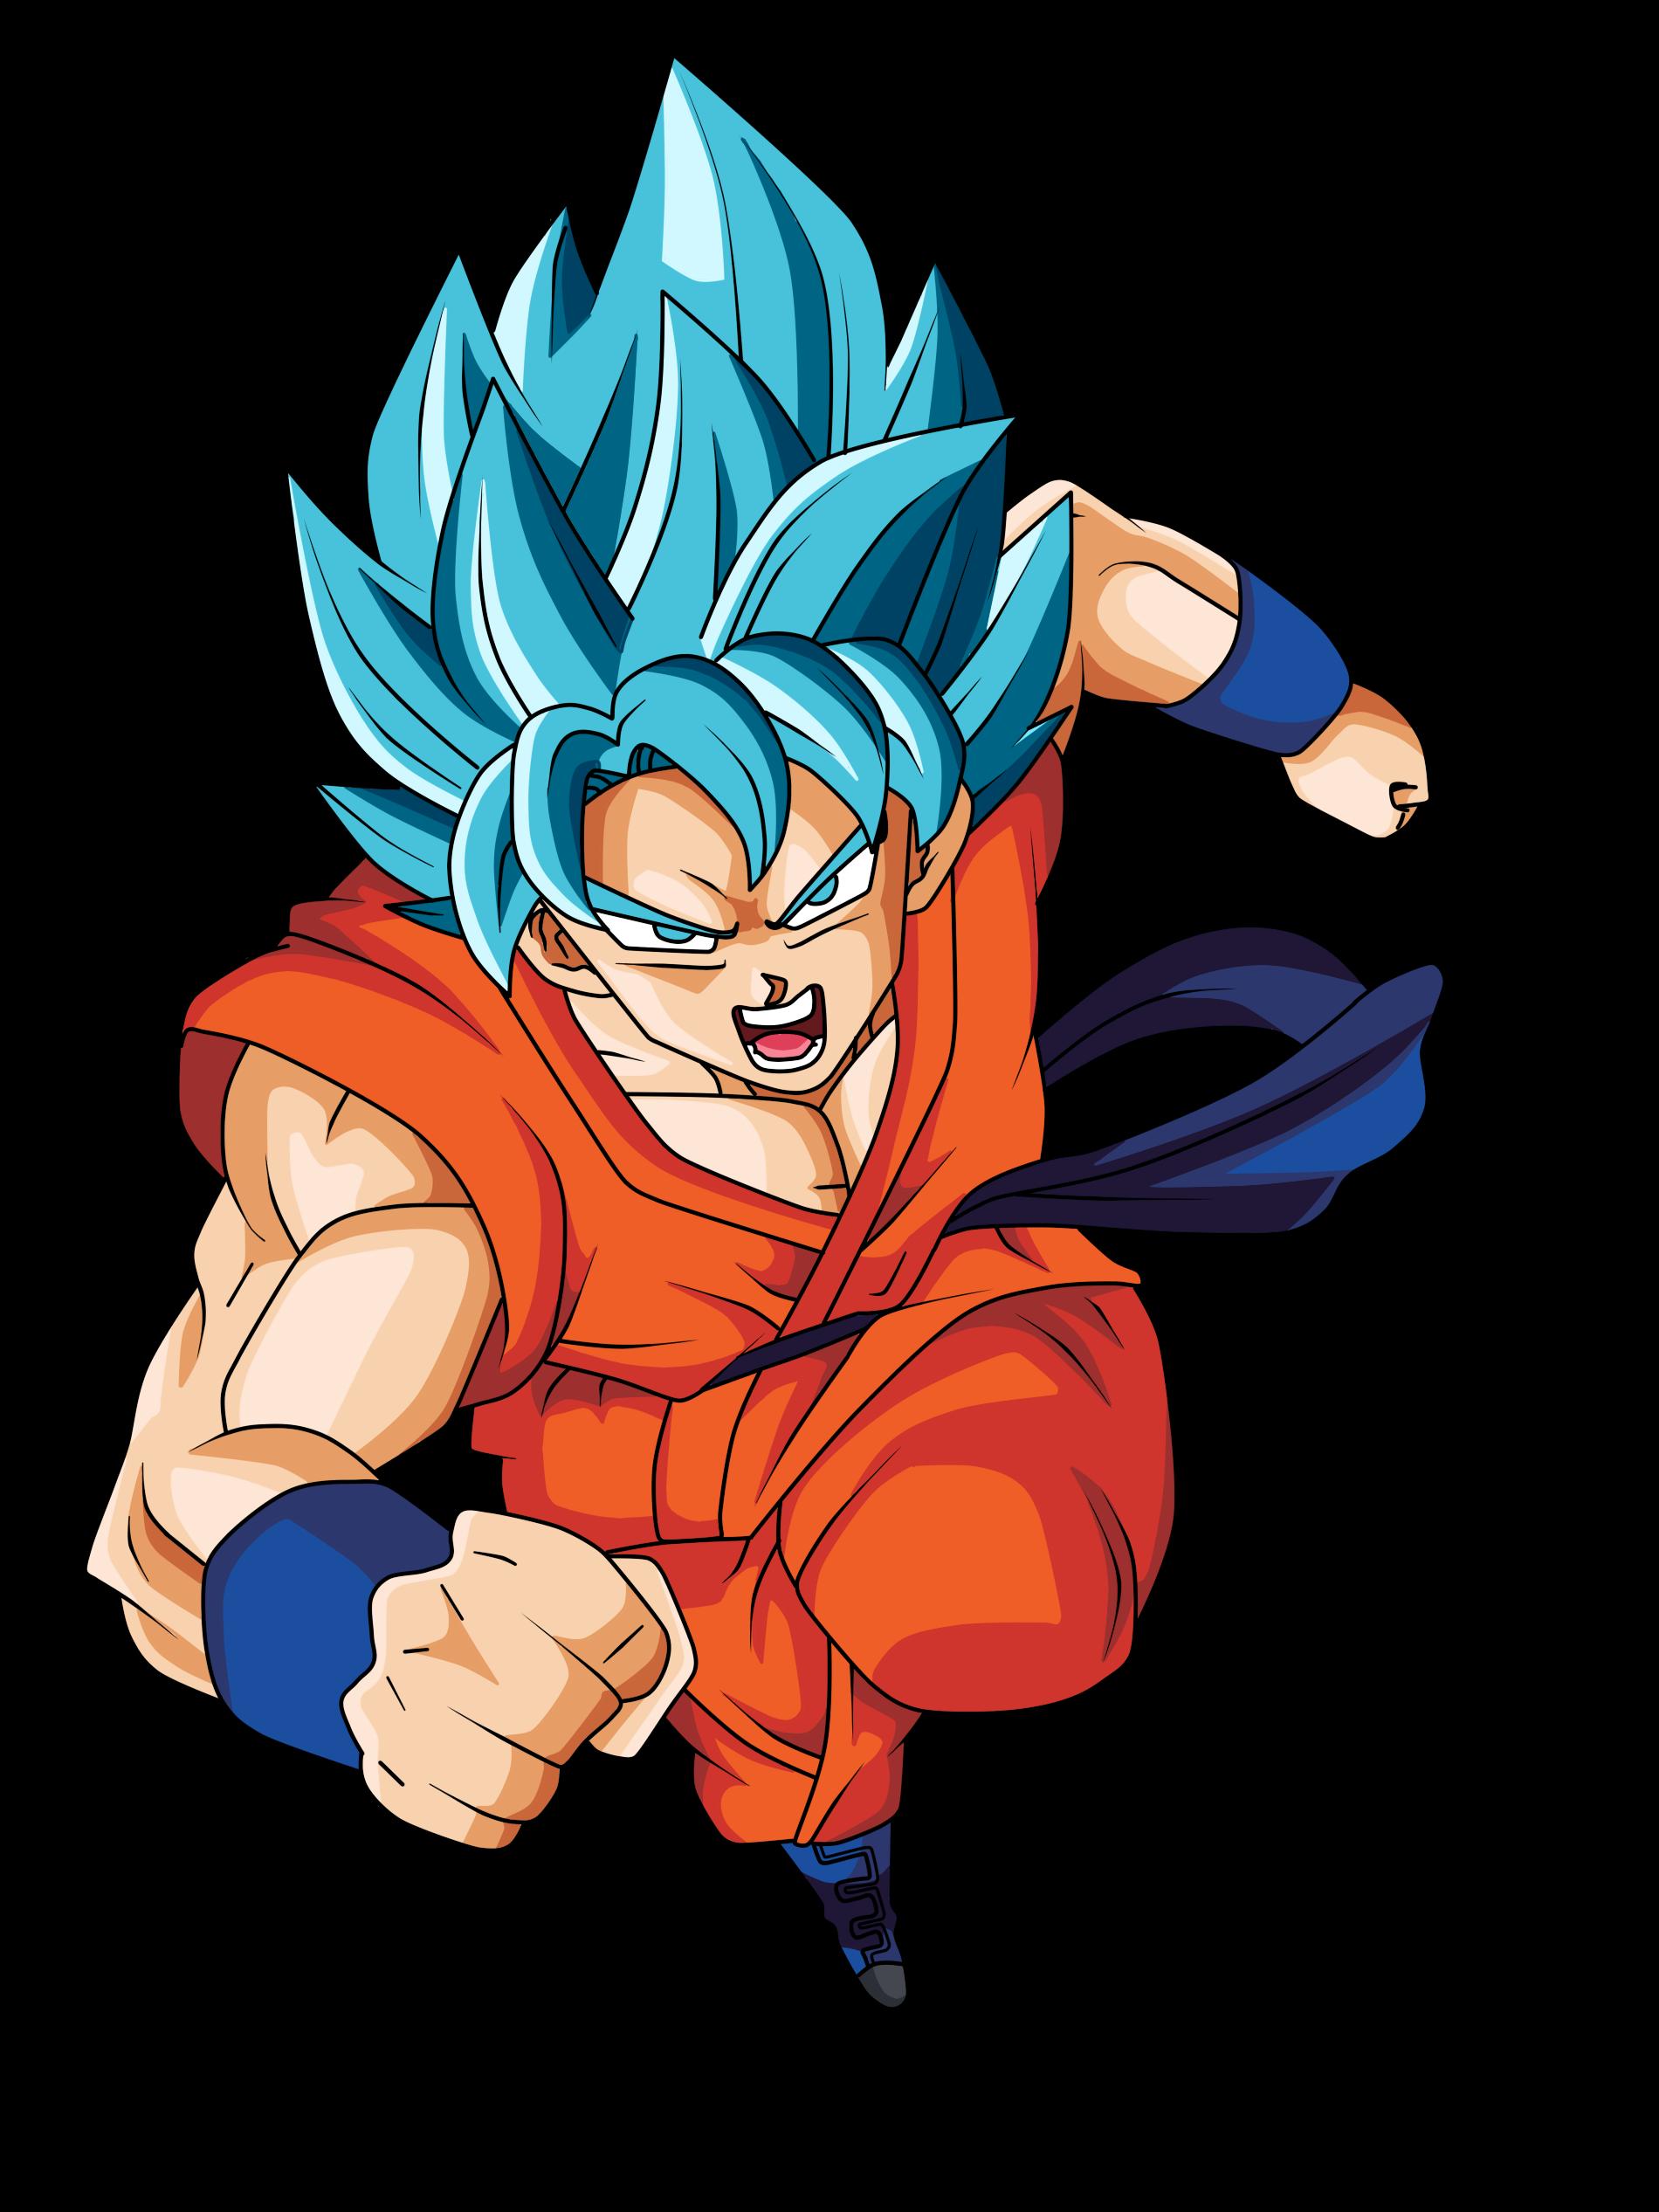 Goku SSGSS   Dragon ball Super   Render by xAntroGamerx on ...